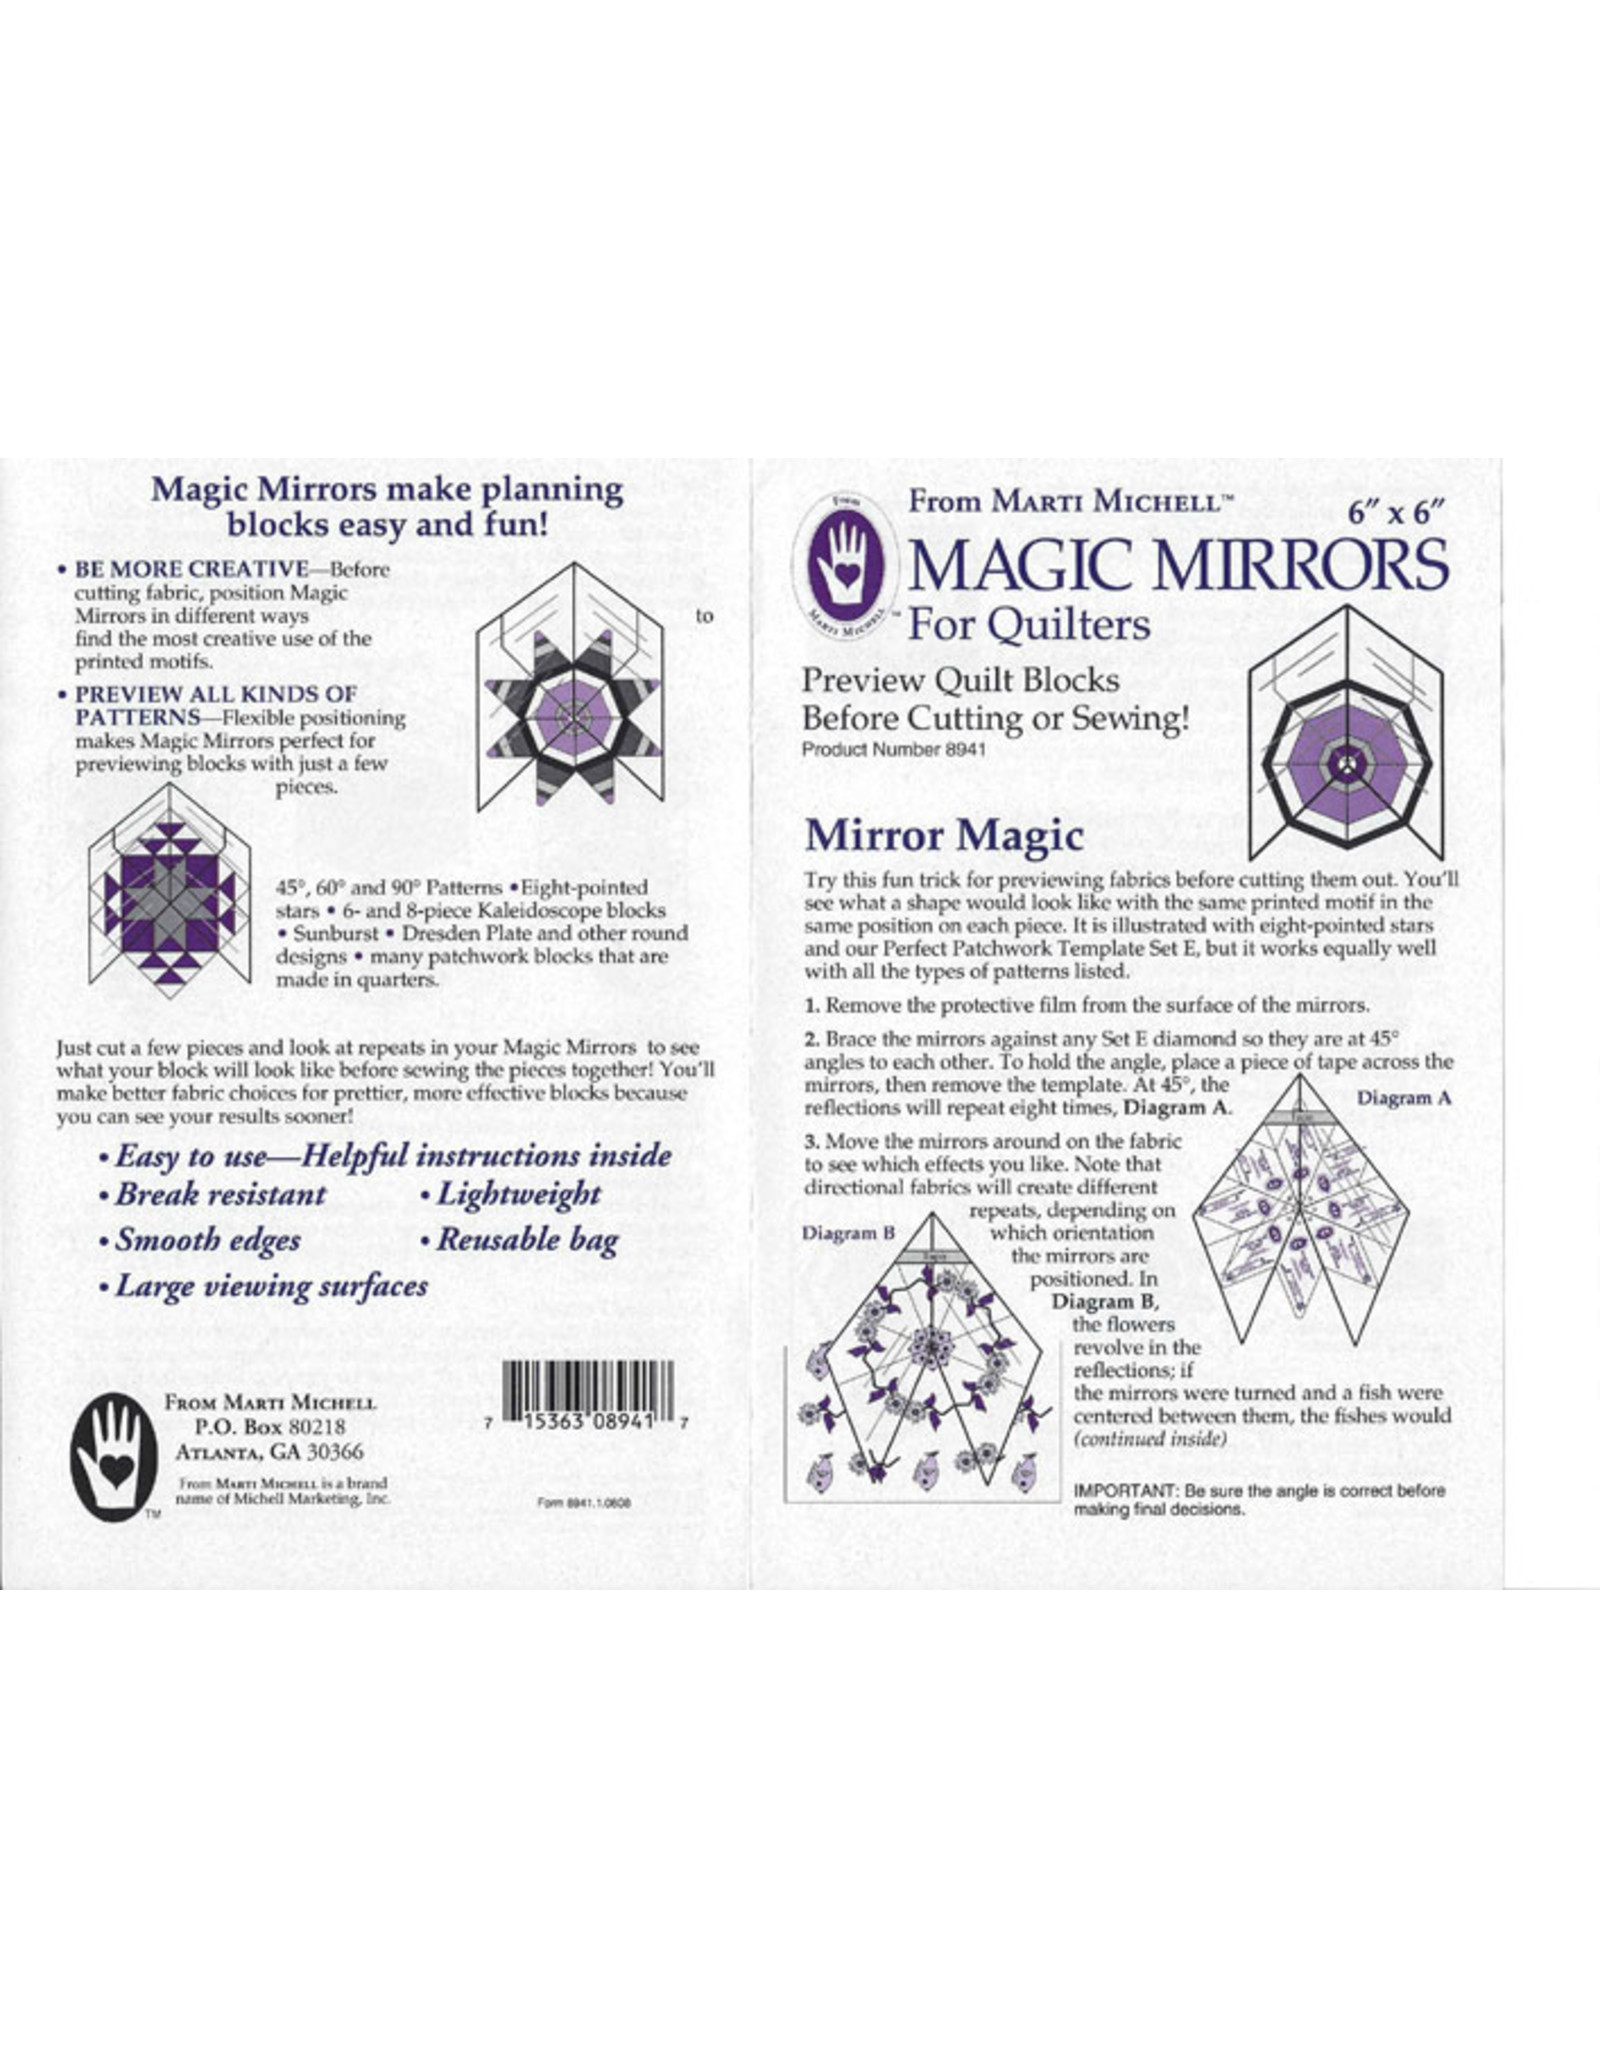 Magic Mirrors - 6 x 6 inch